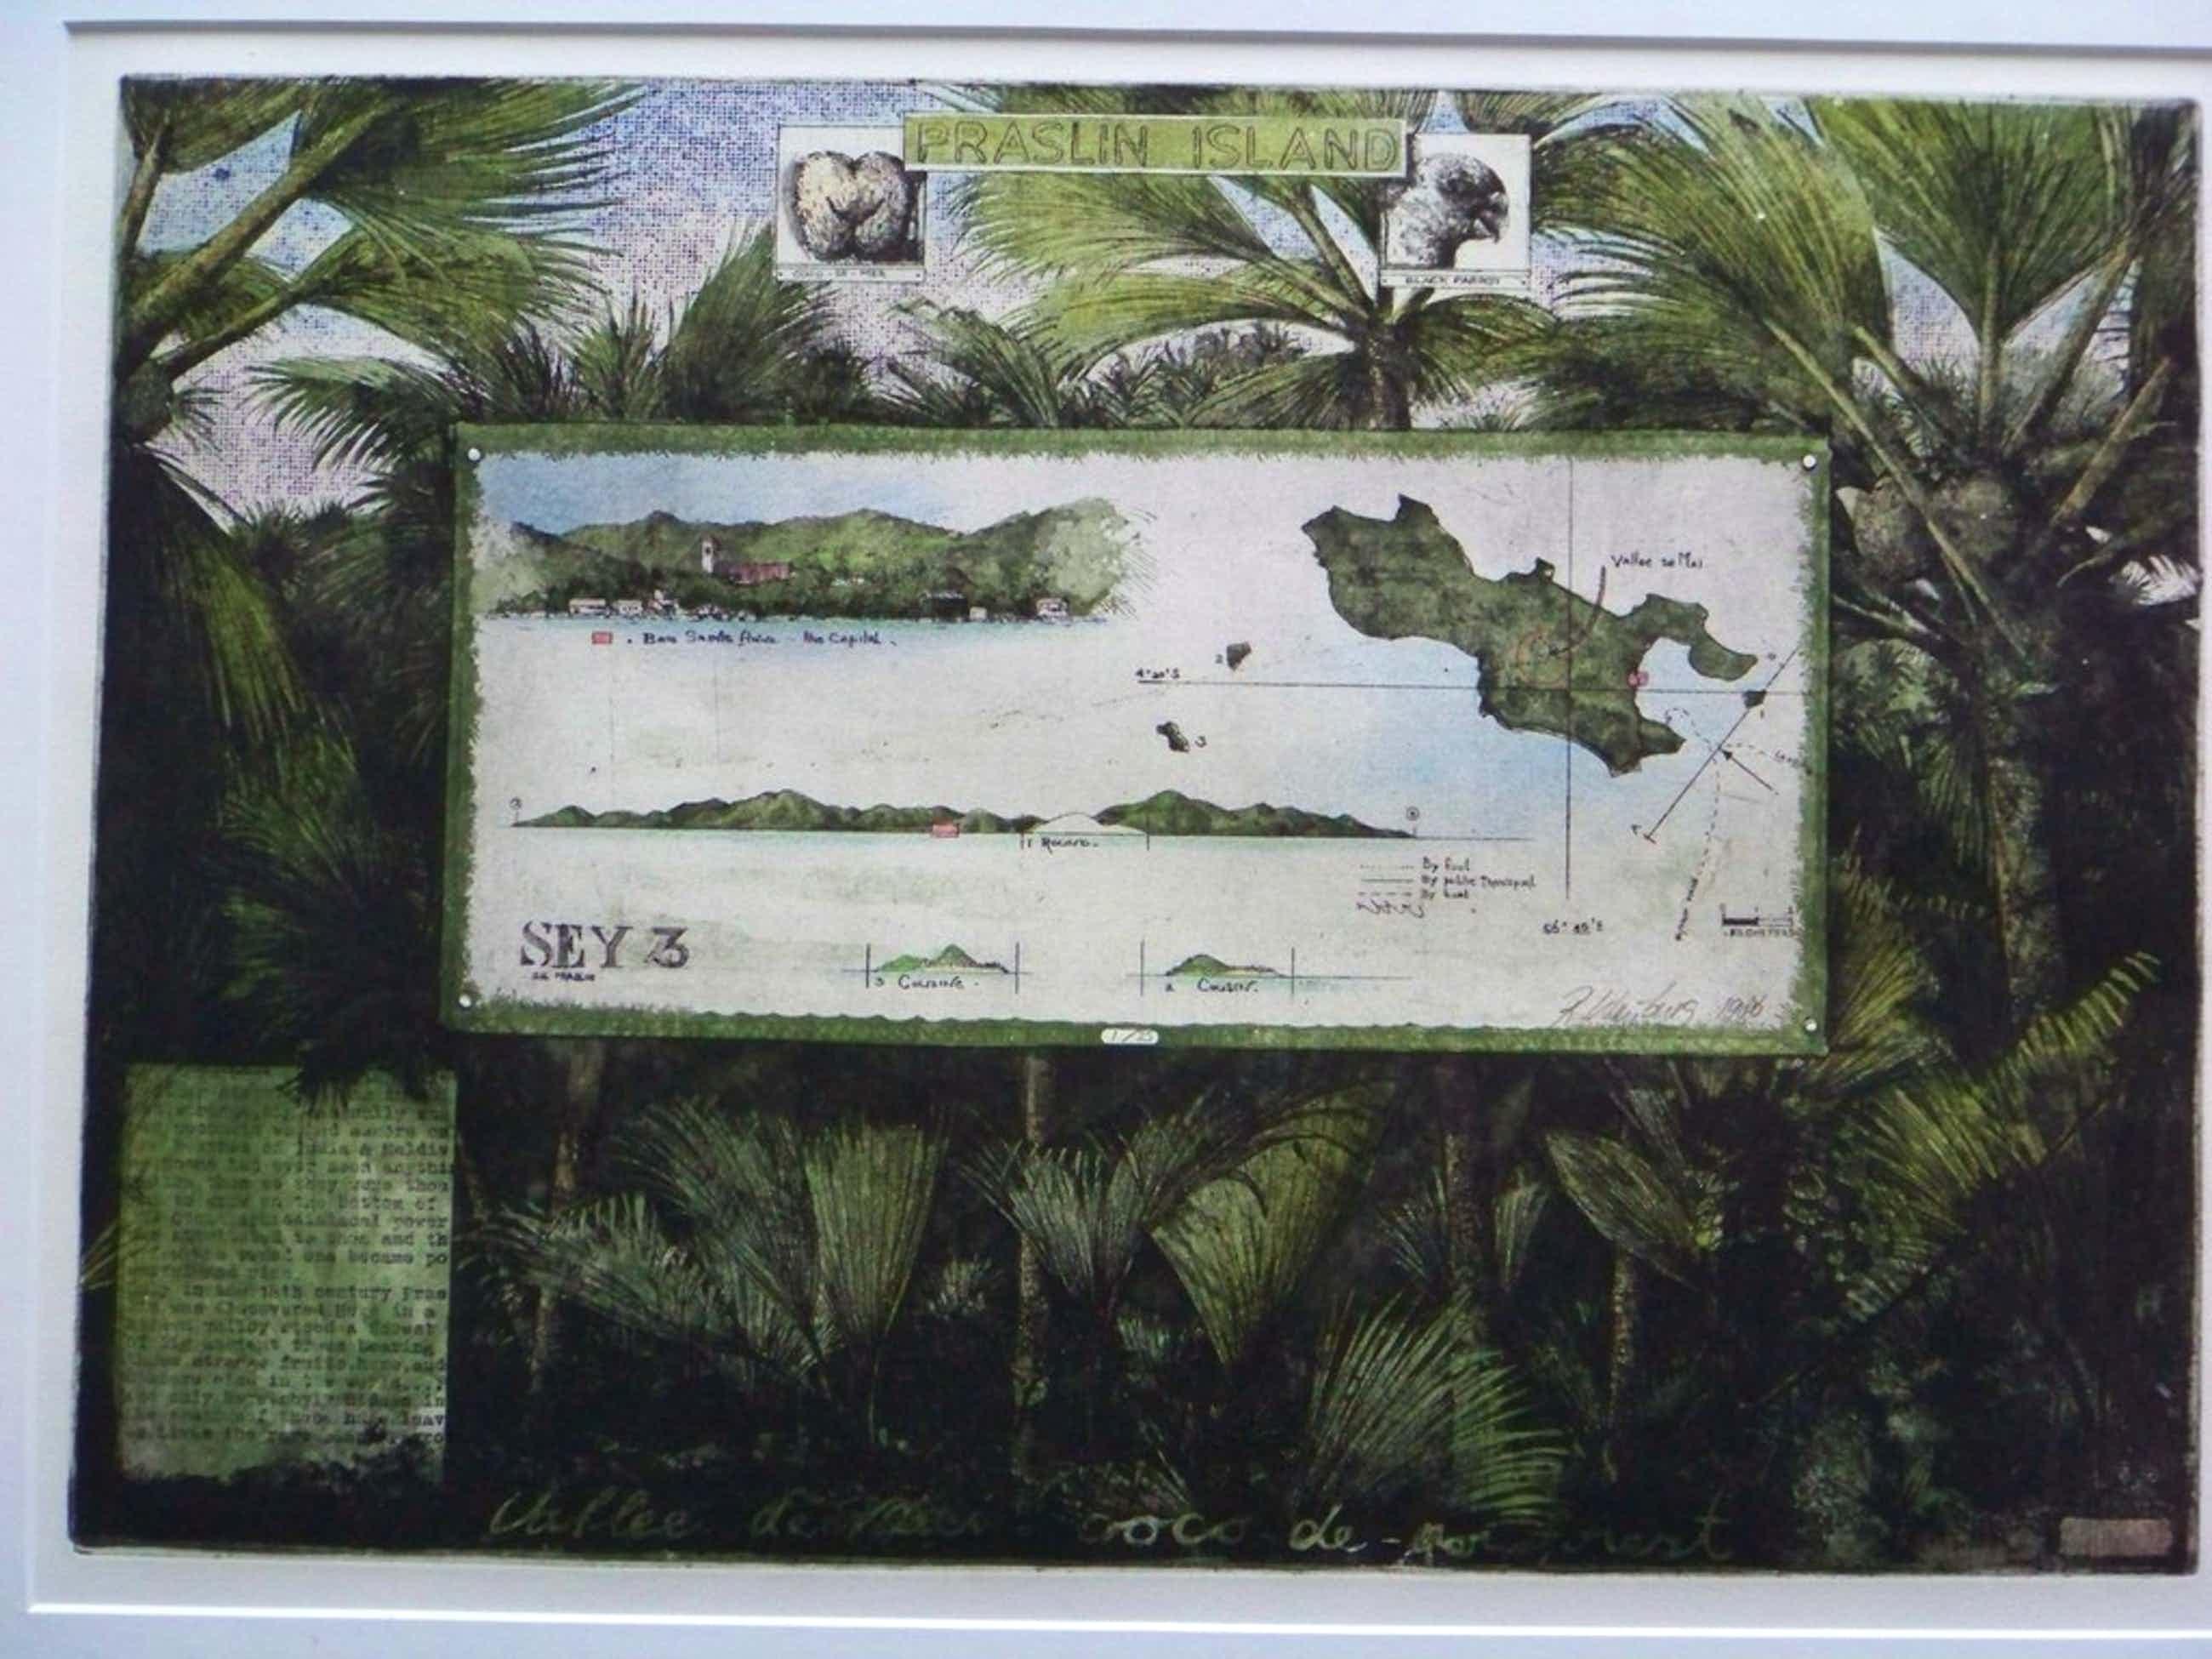 Rolf Weijburg, Ets, Praslin Island kopen? Bied vanaf 100!